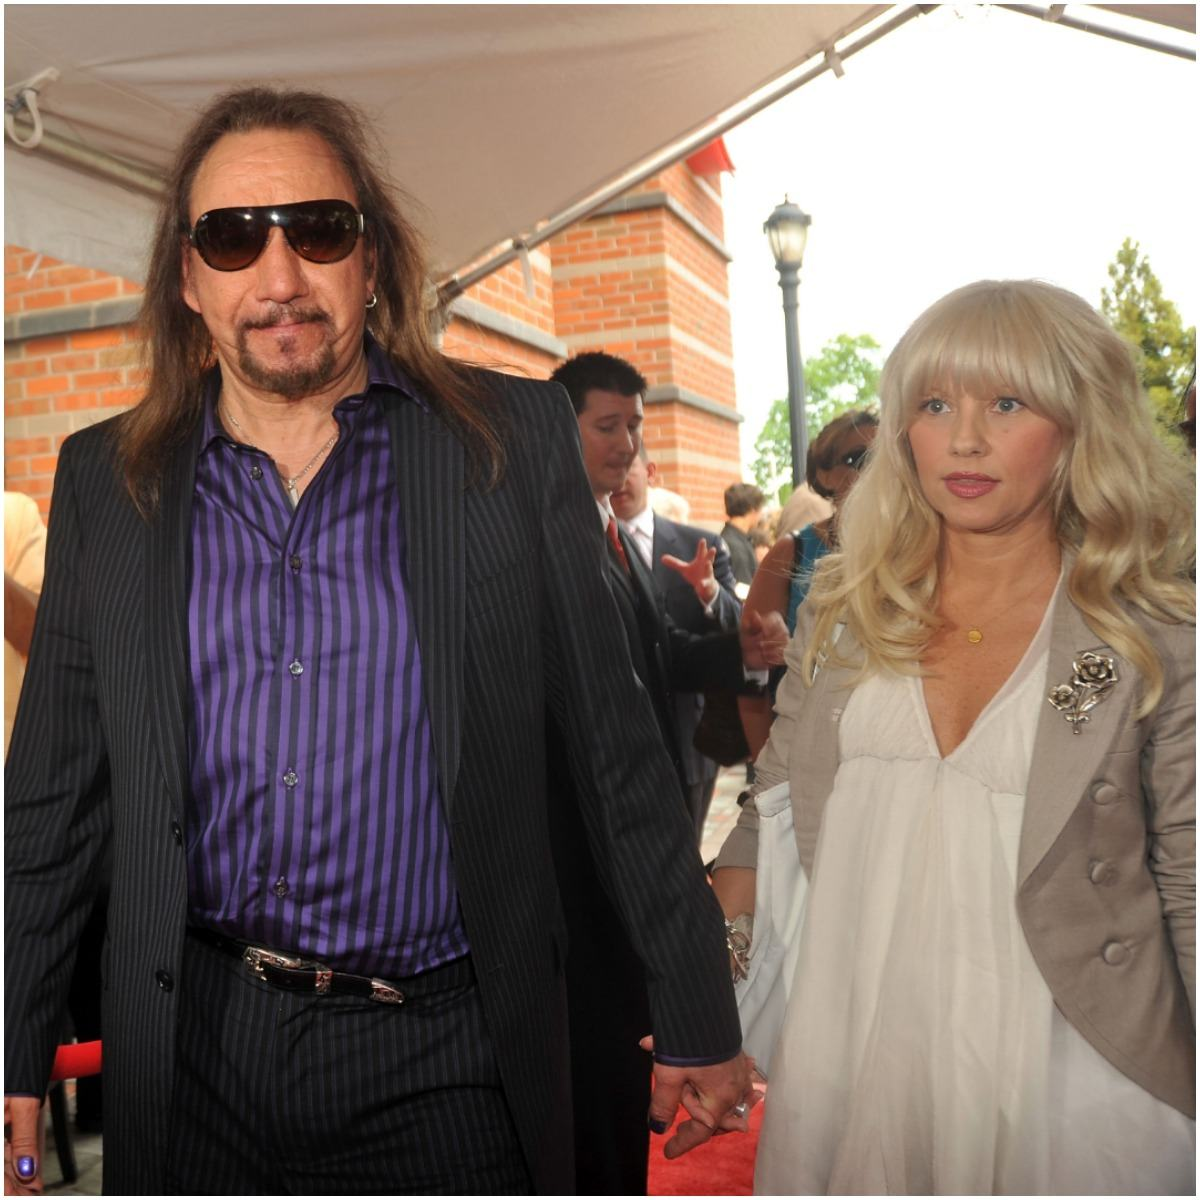 Ace Frehley and girlfriend Rachael Gordon